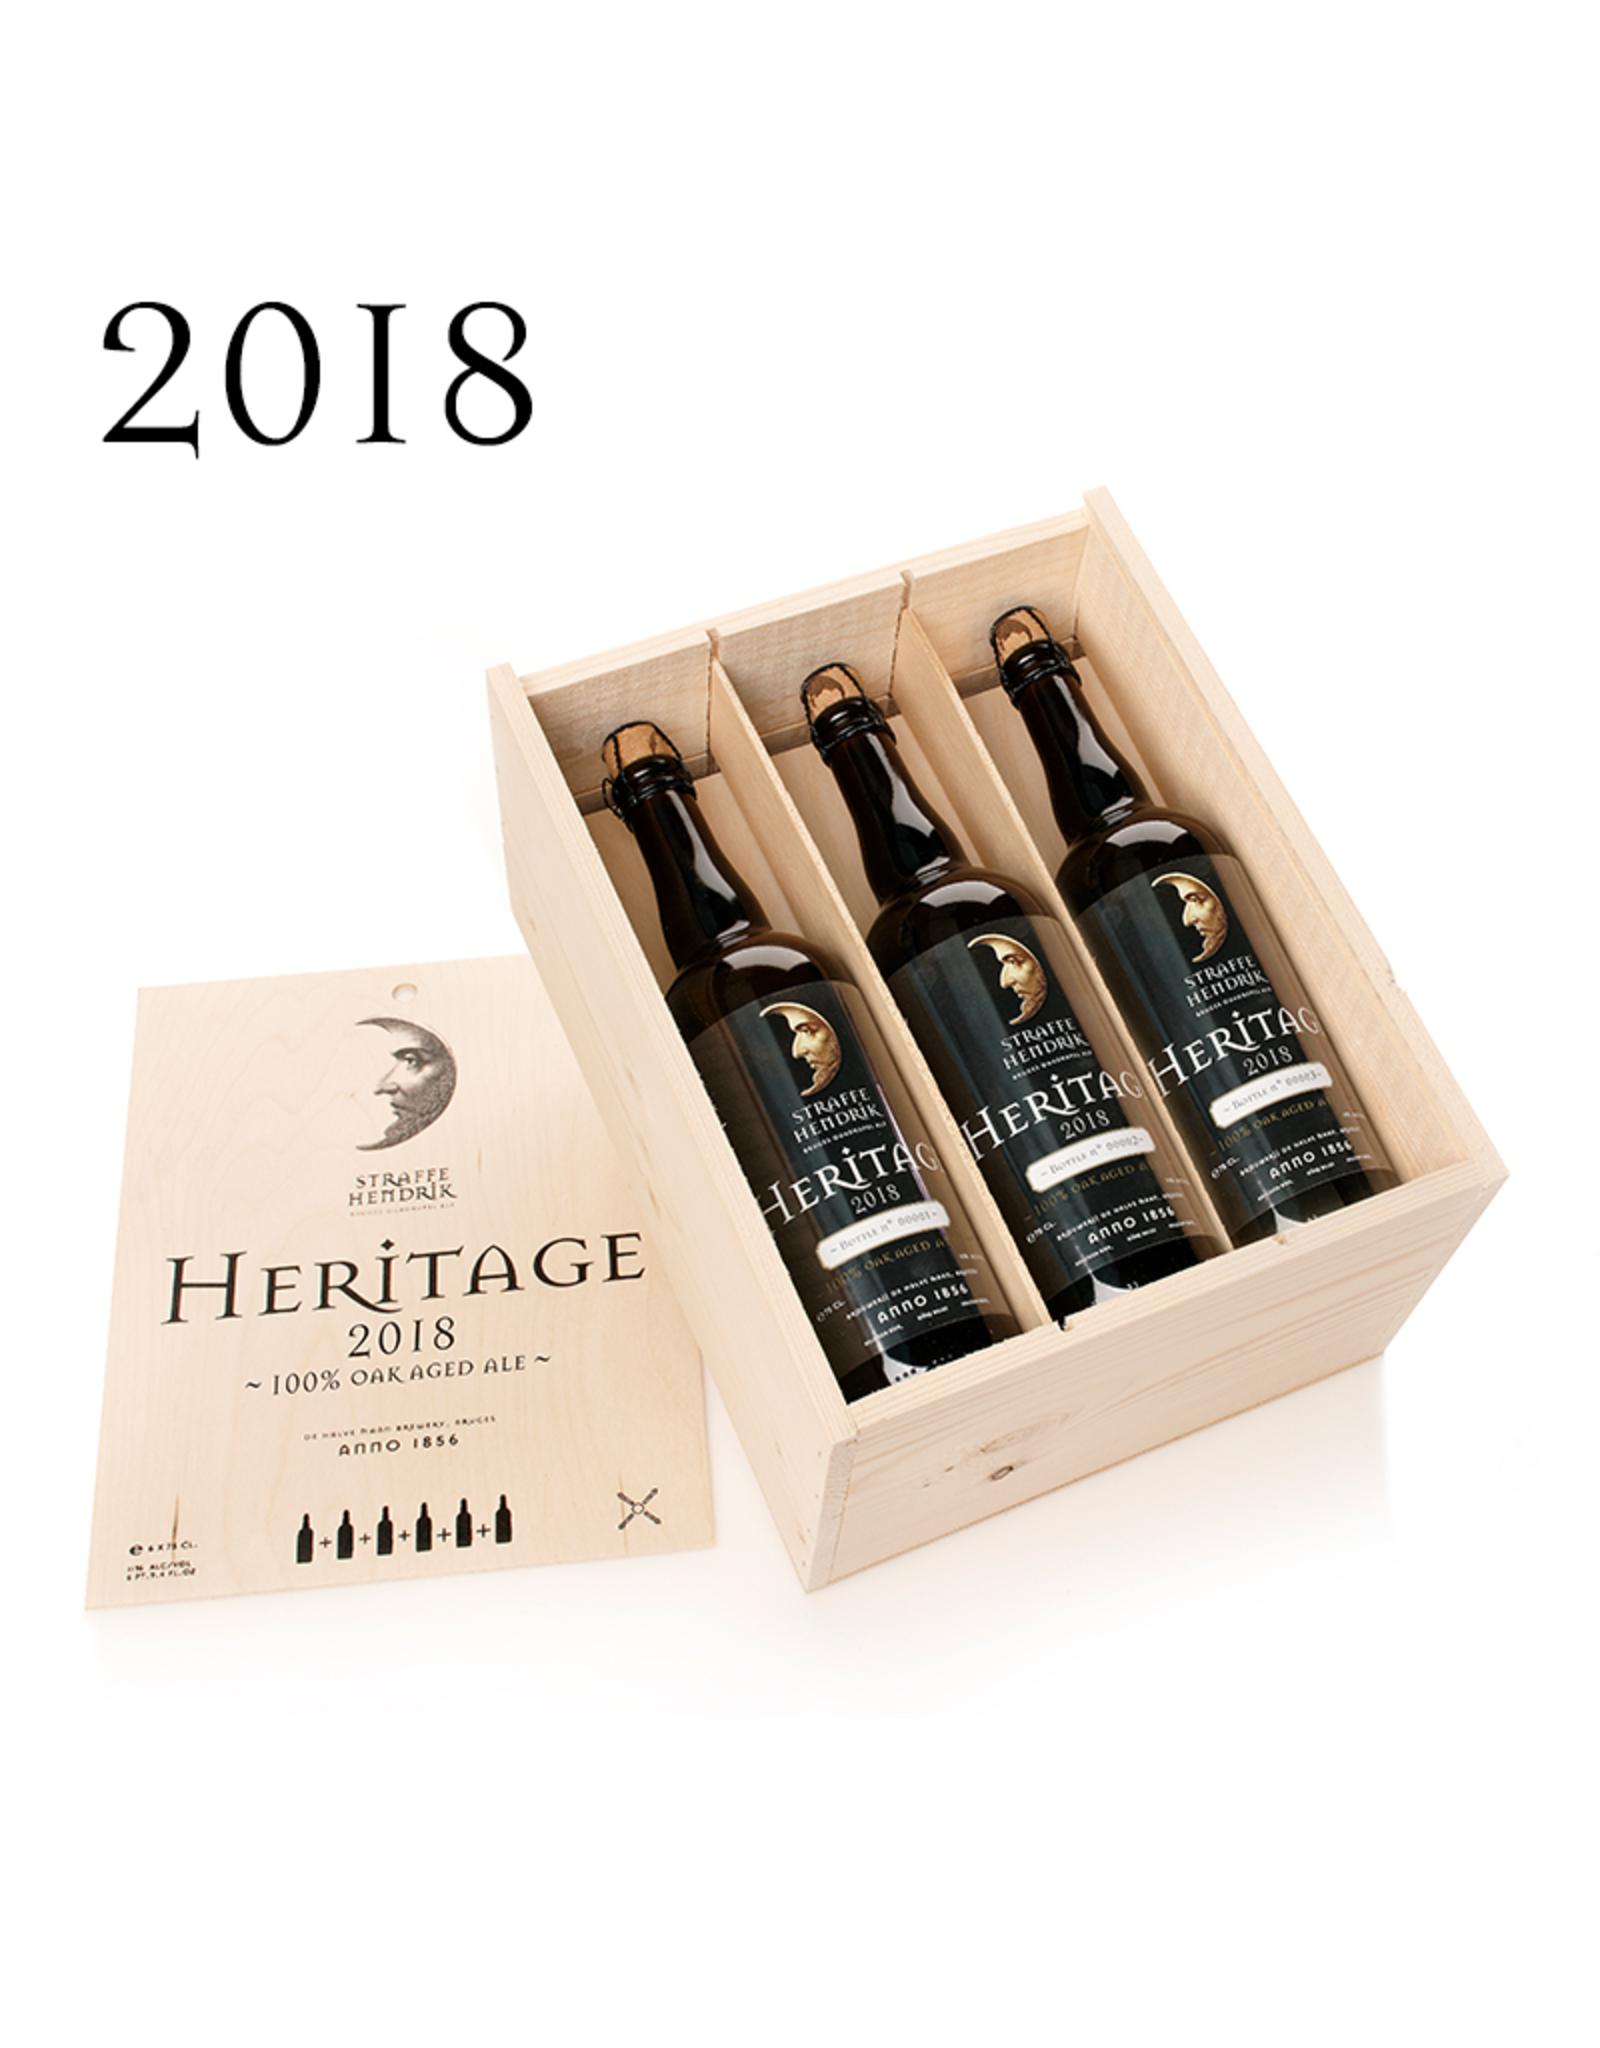 Straffe Hendrik Heritage 2018 6 x 75 cl